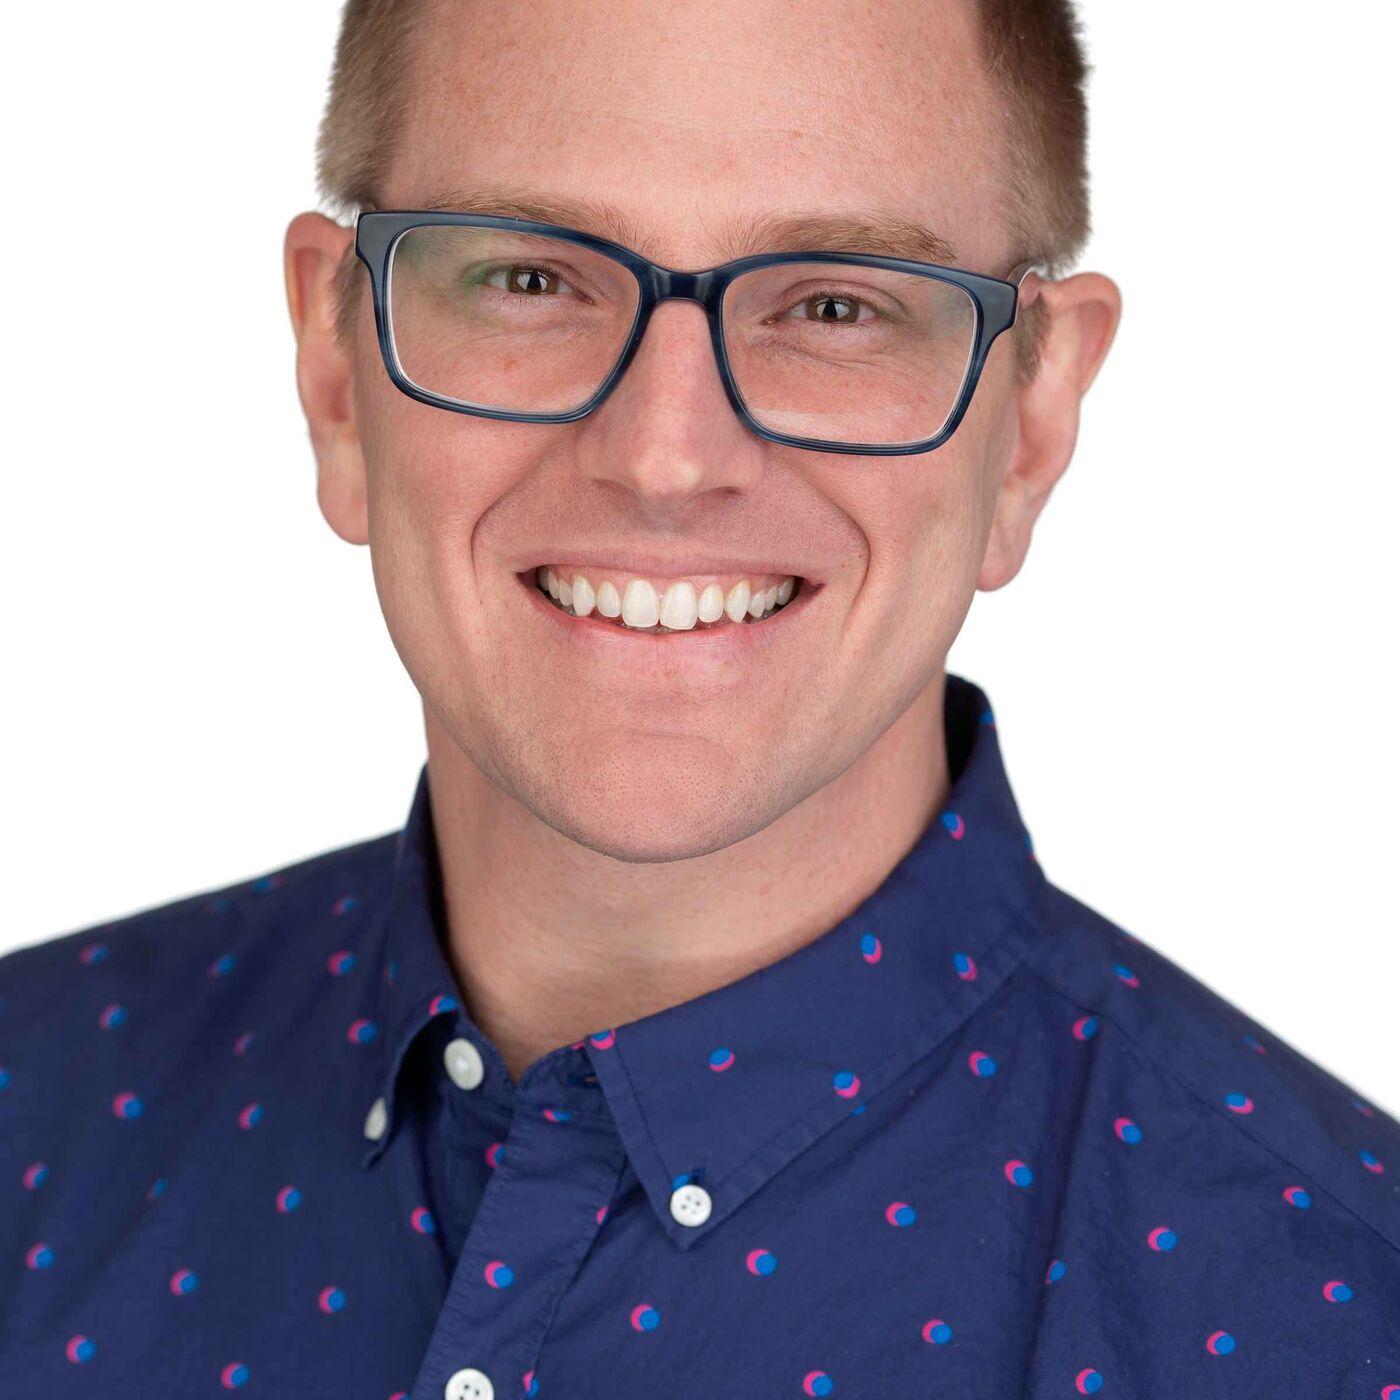 Episode 60: Christian Beck - Innovatemap